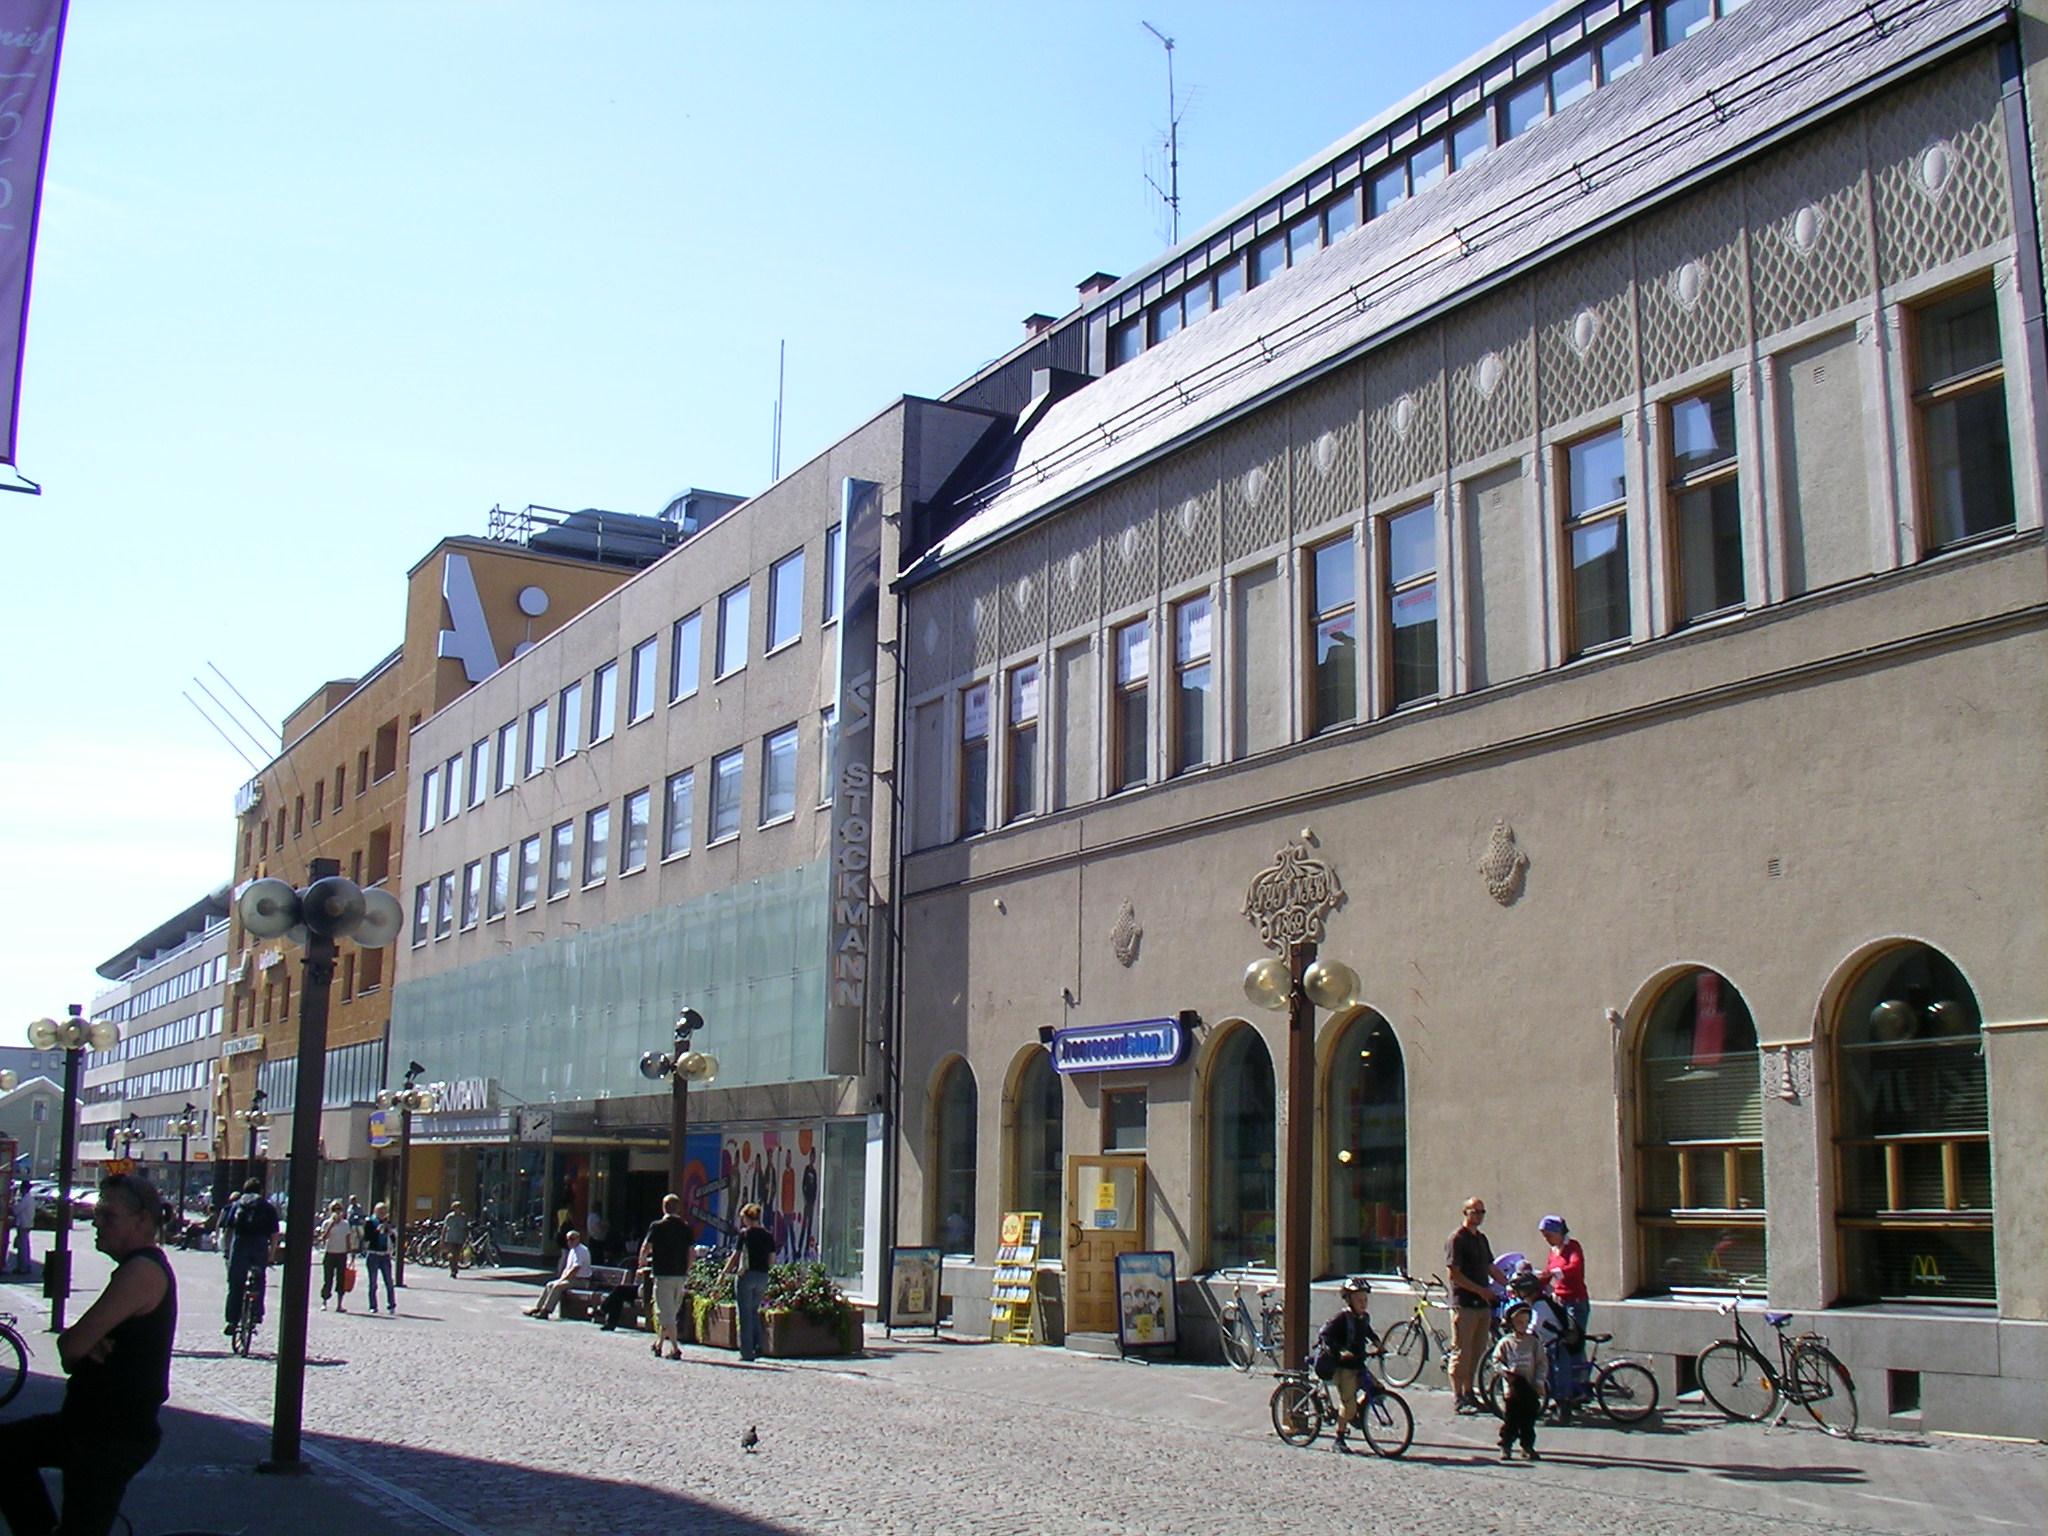 Oulu Rotuaari